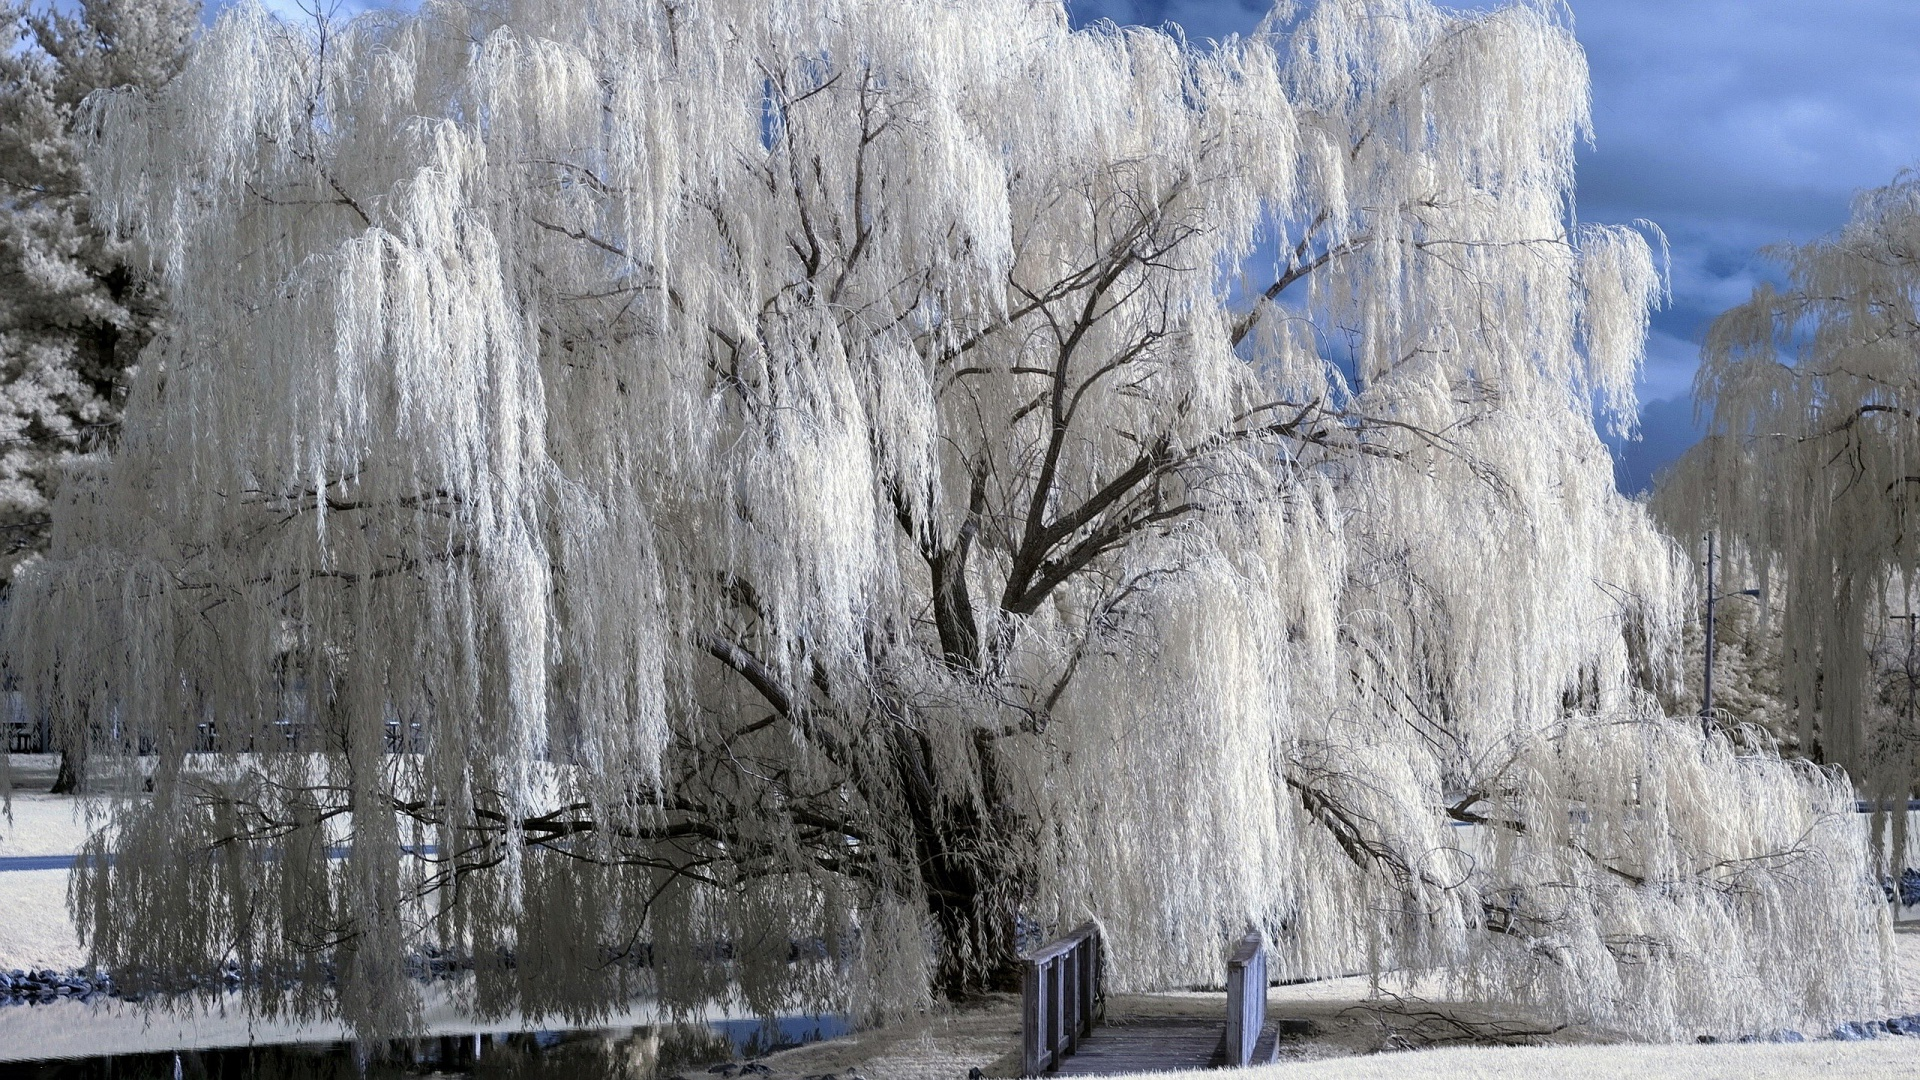 Winter Wallpapers HD 1920x1080